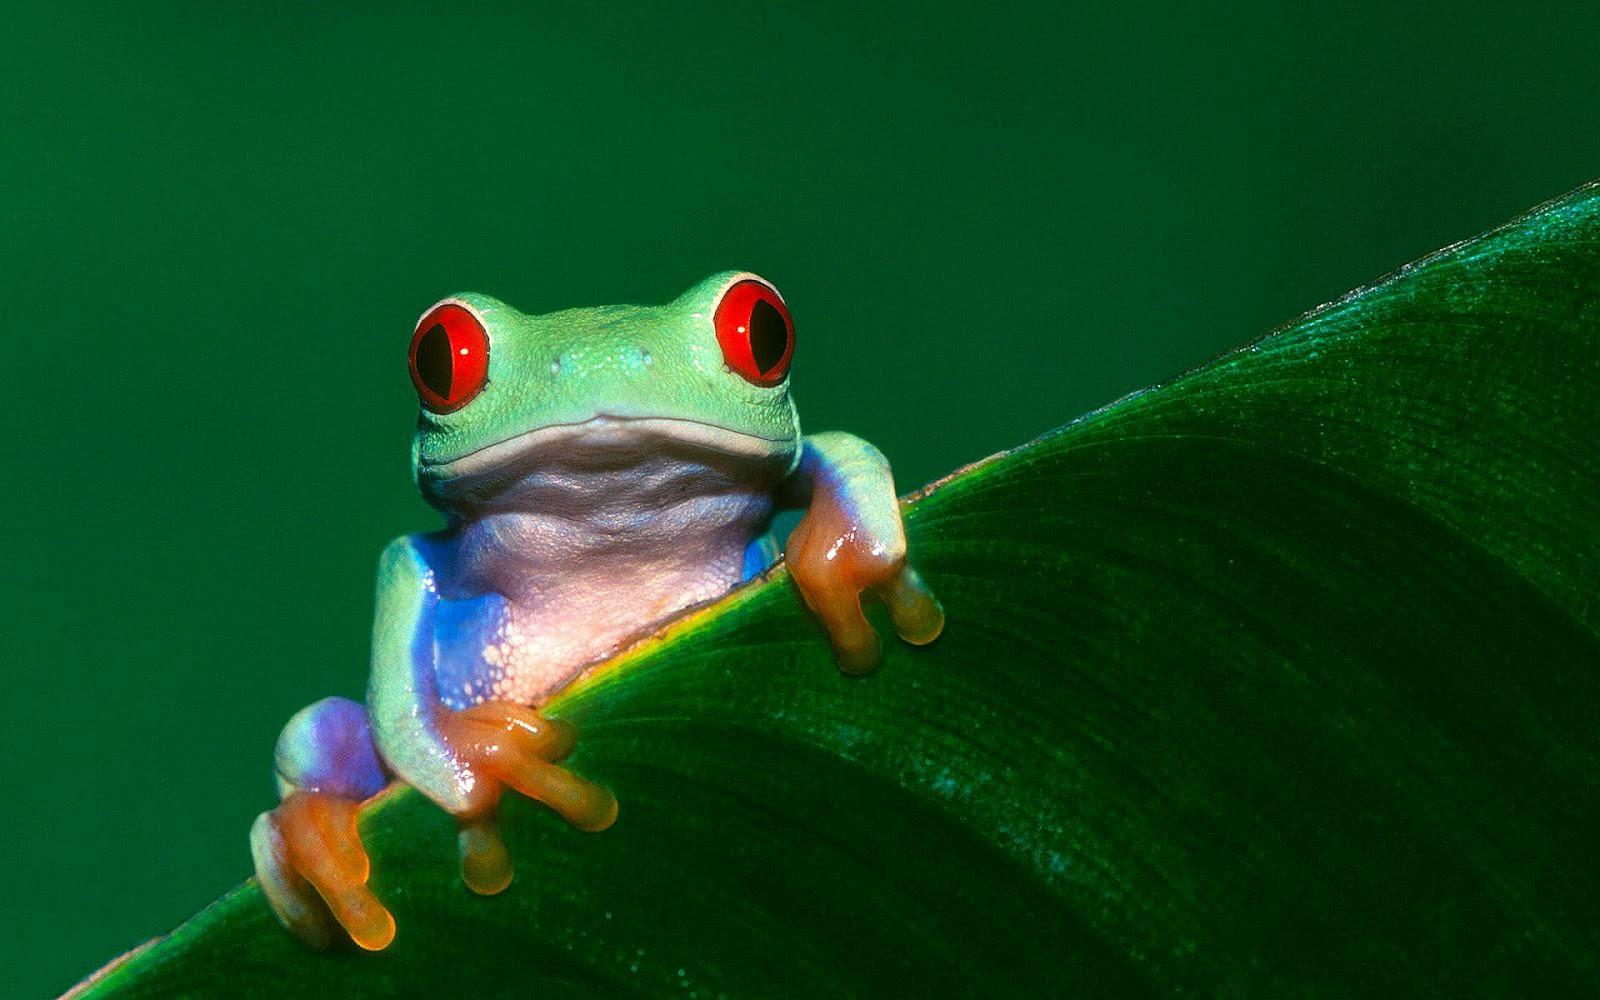 Groene Kikker Op Groen Blad Mooie Leuke Achtergronden